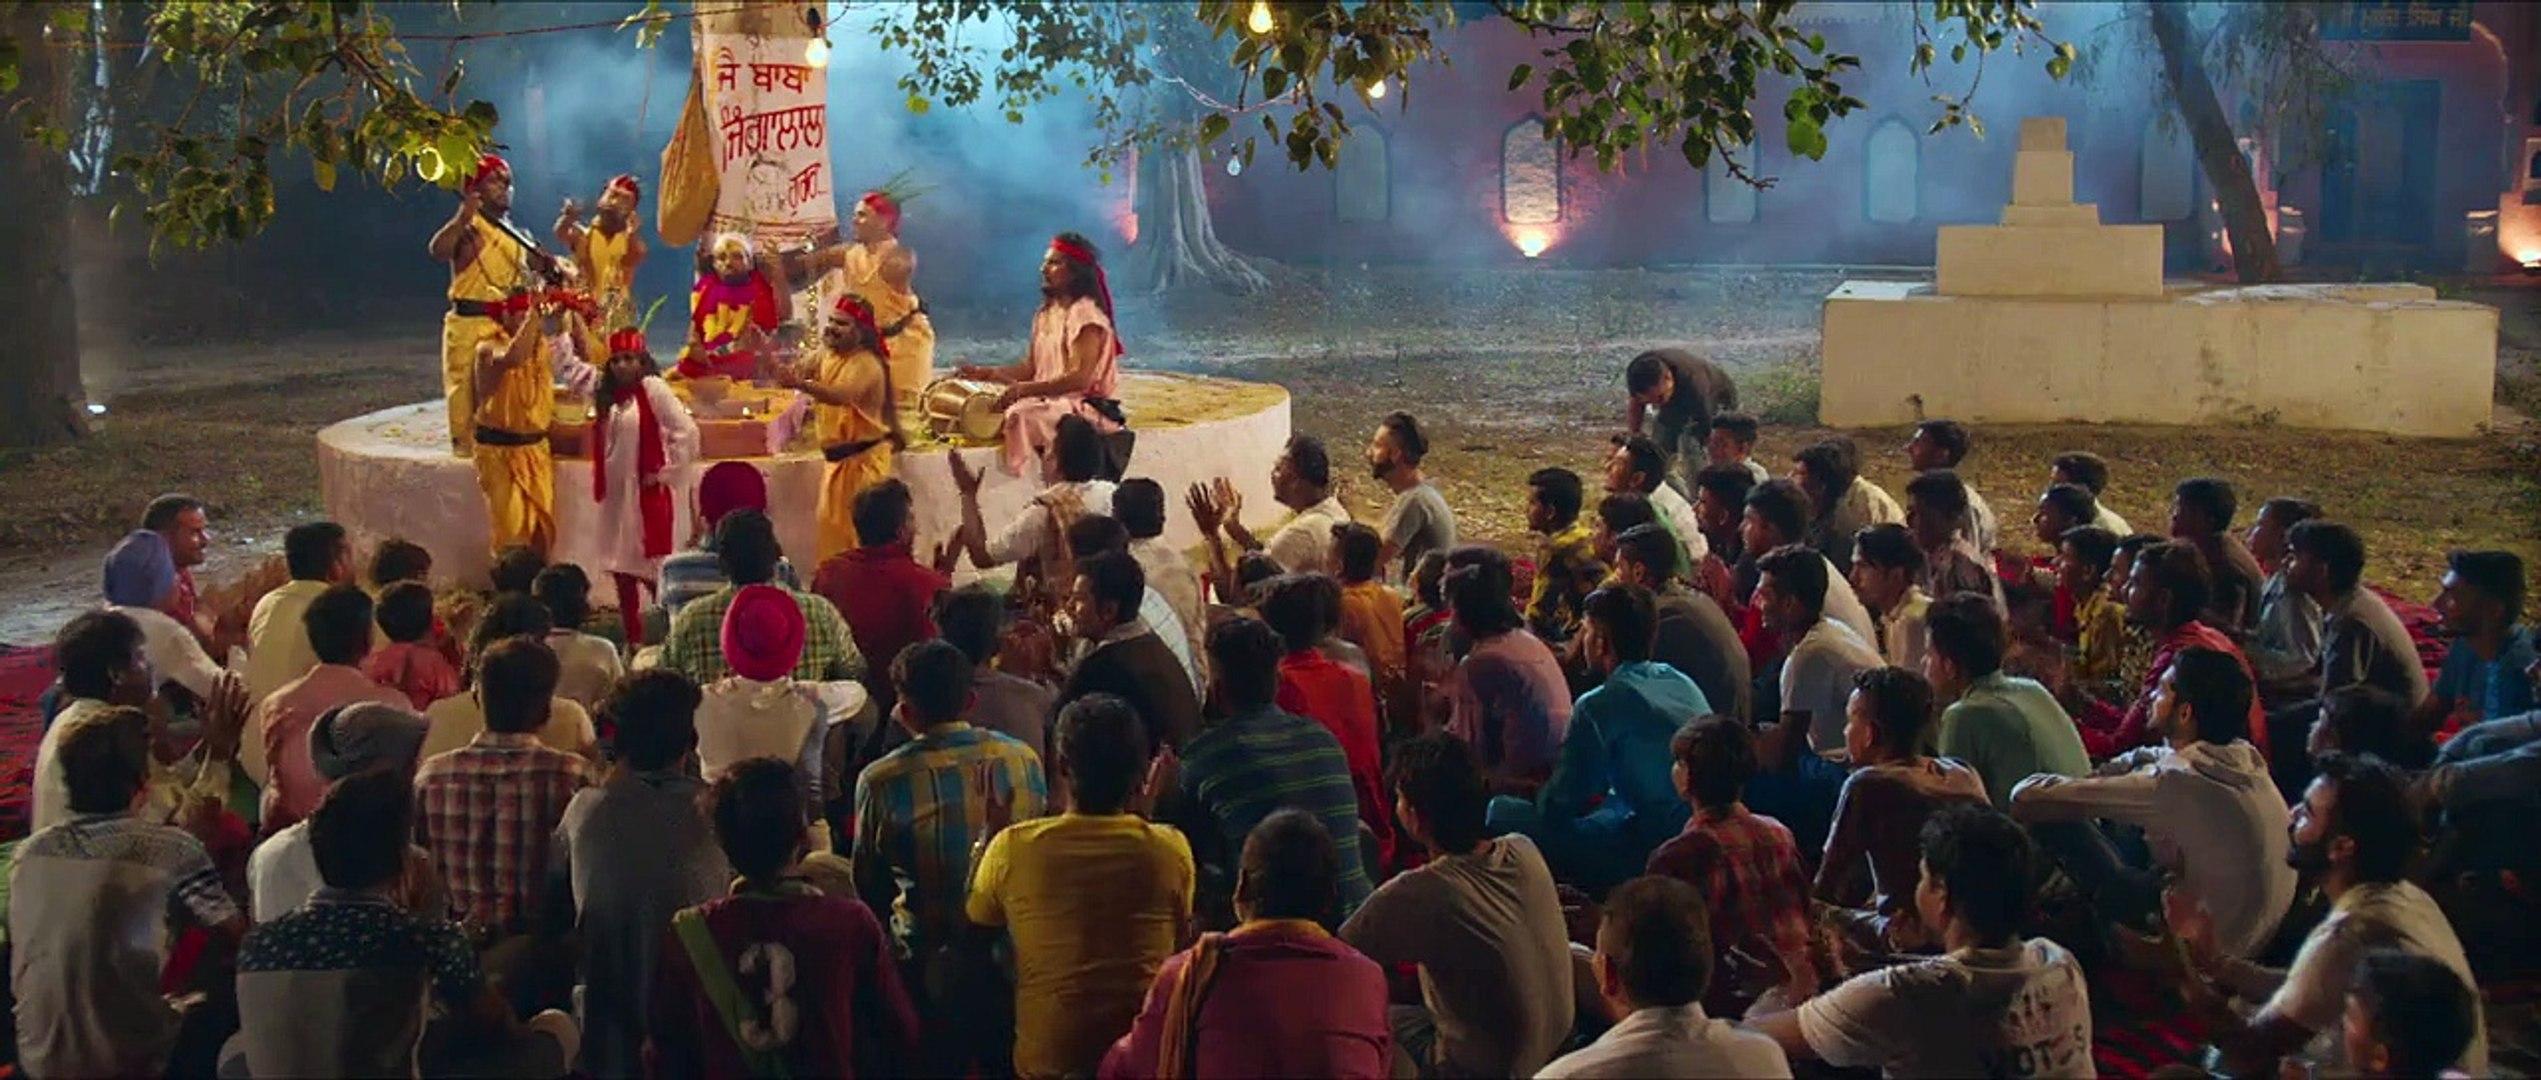 Family 420 Once Again - Part 2   Gurchet Chitarkar, Jazz Sodhi   Latest Punjabi Movies